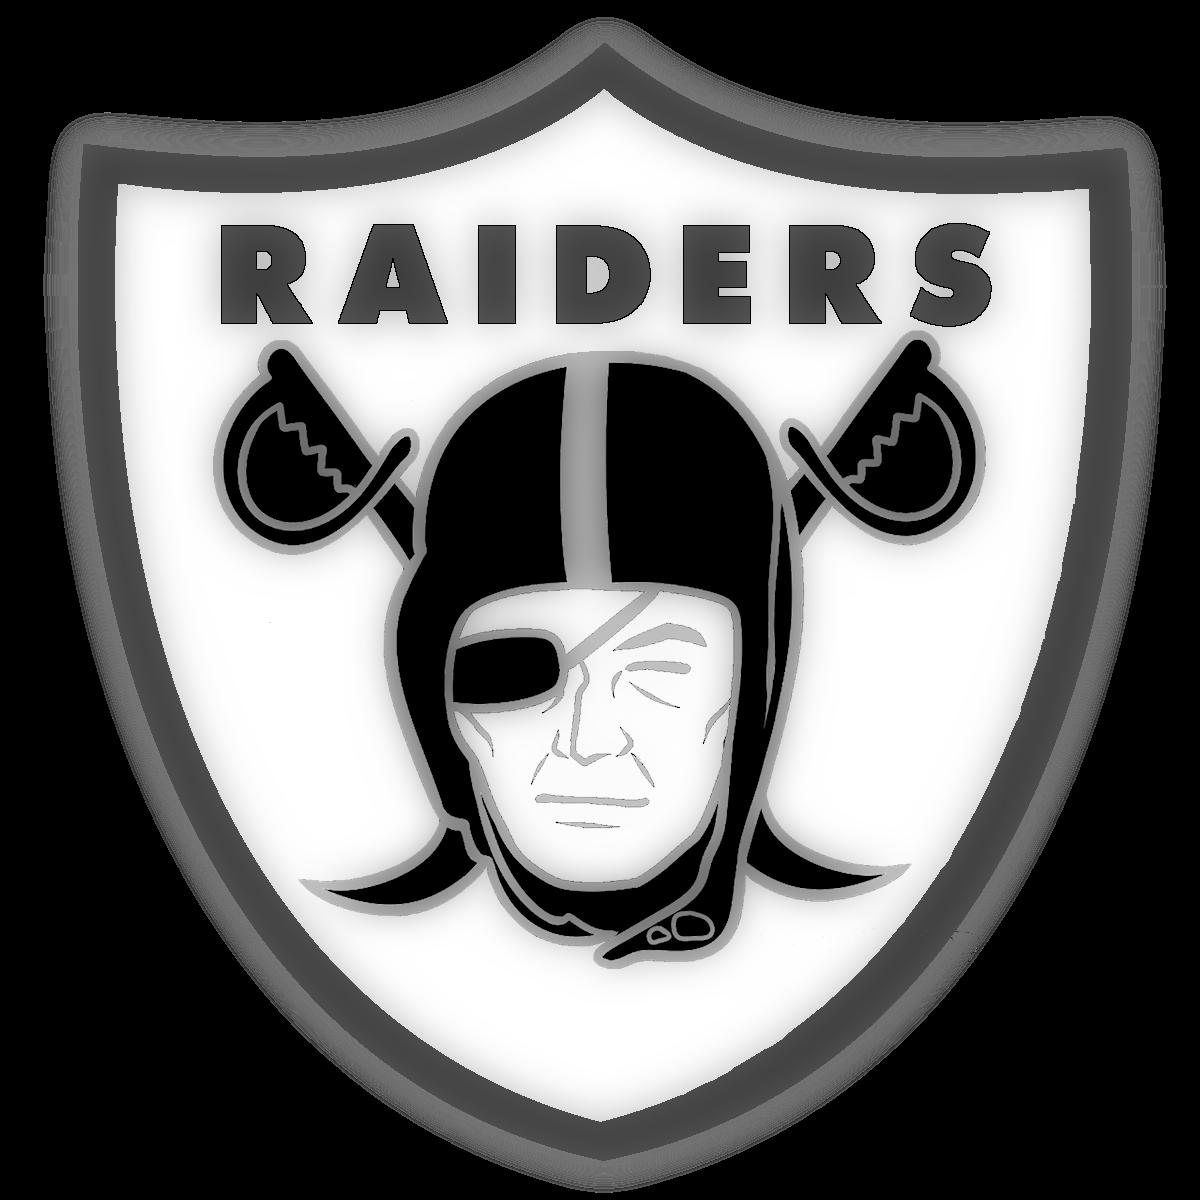 Oakland Raiders Logo (With images) | Oakland raiders logo ...